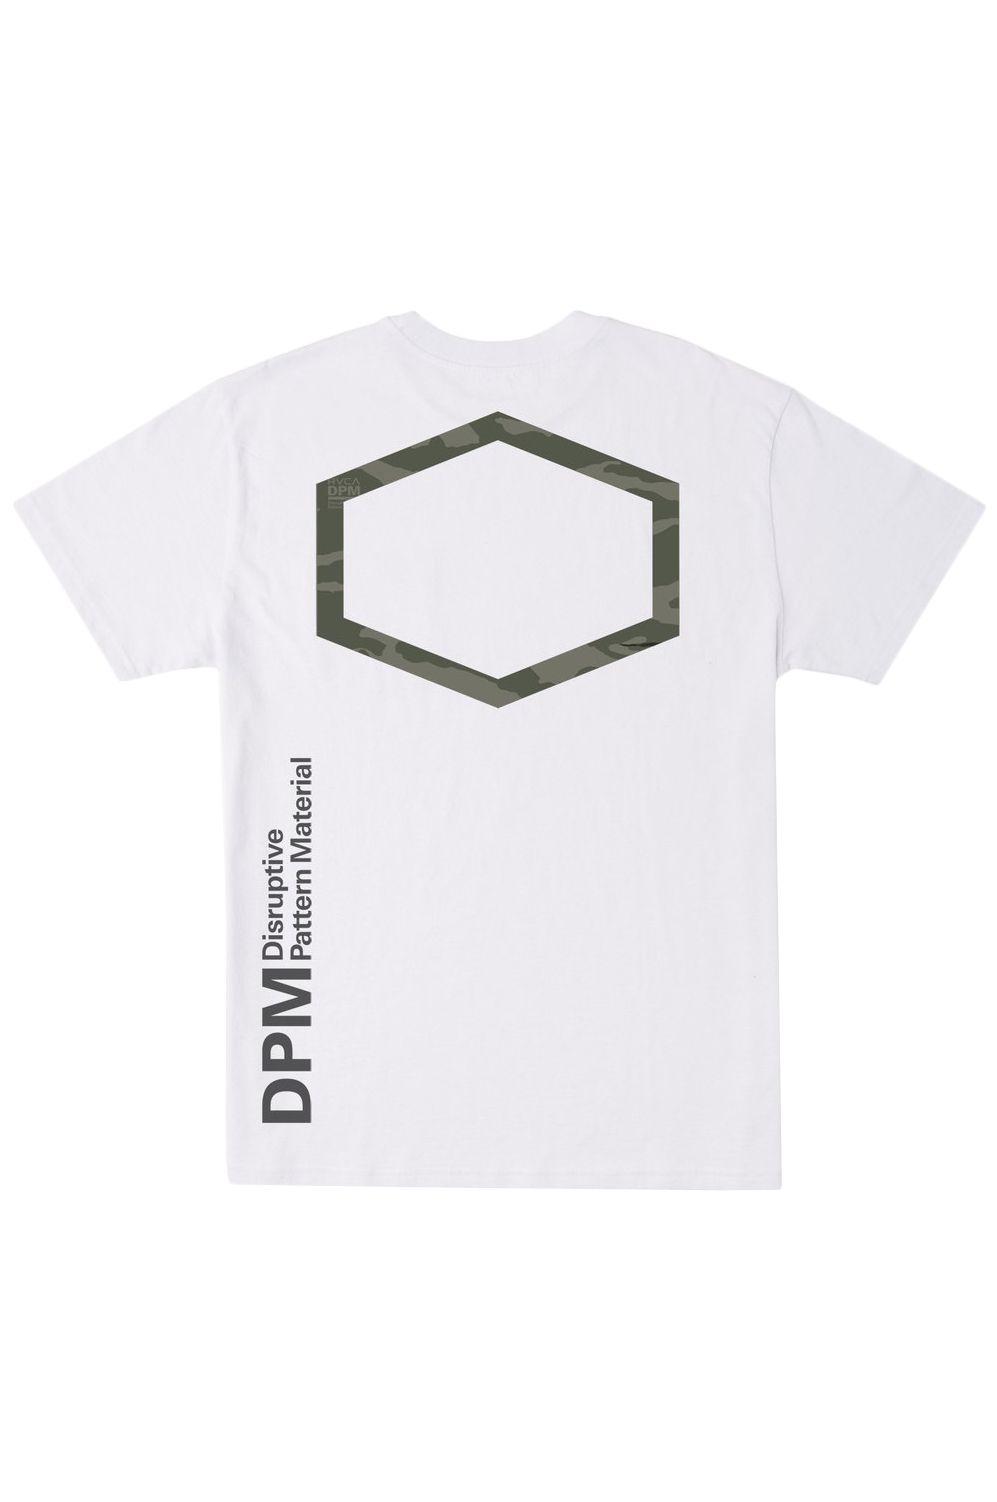 RVCA T-Shirt DPM POCKET TEE DPM White